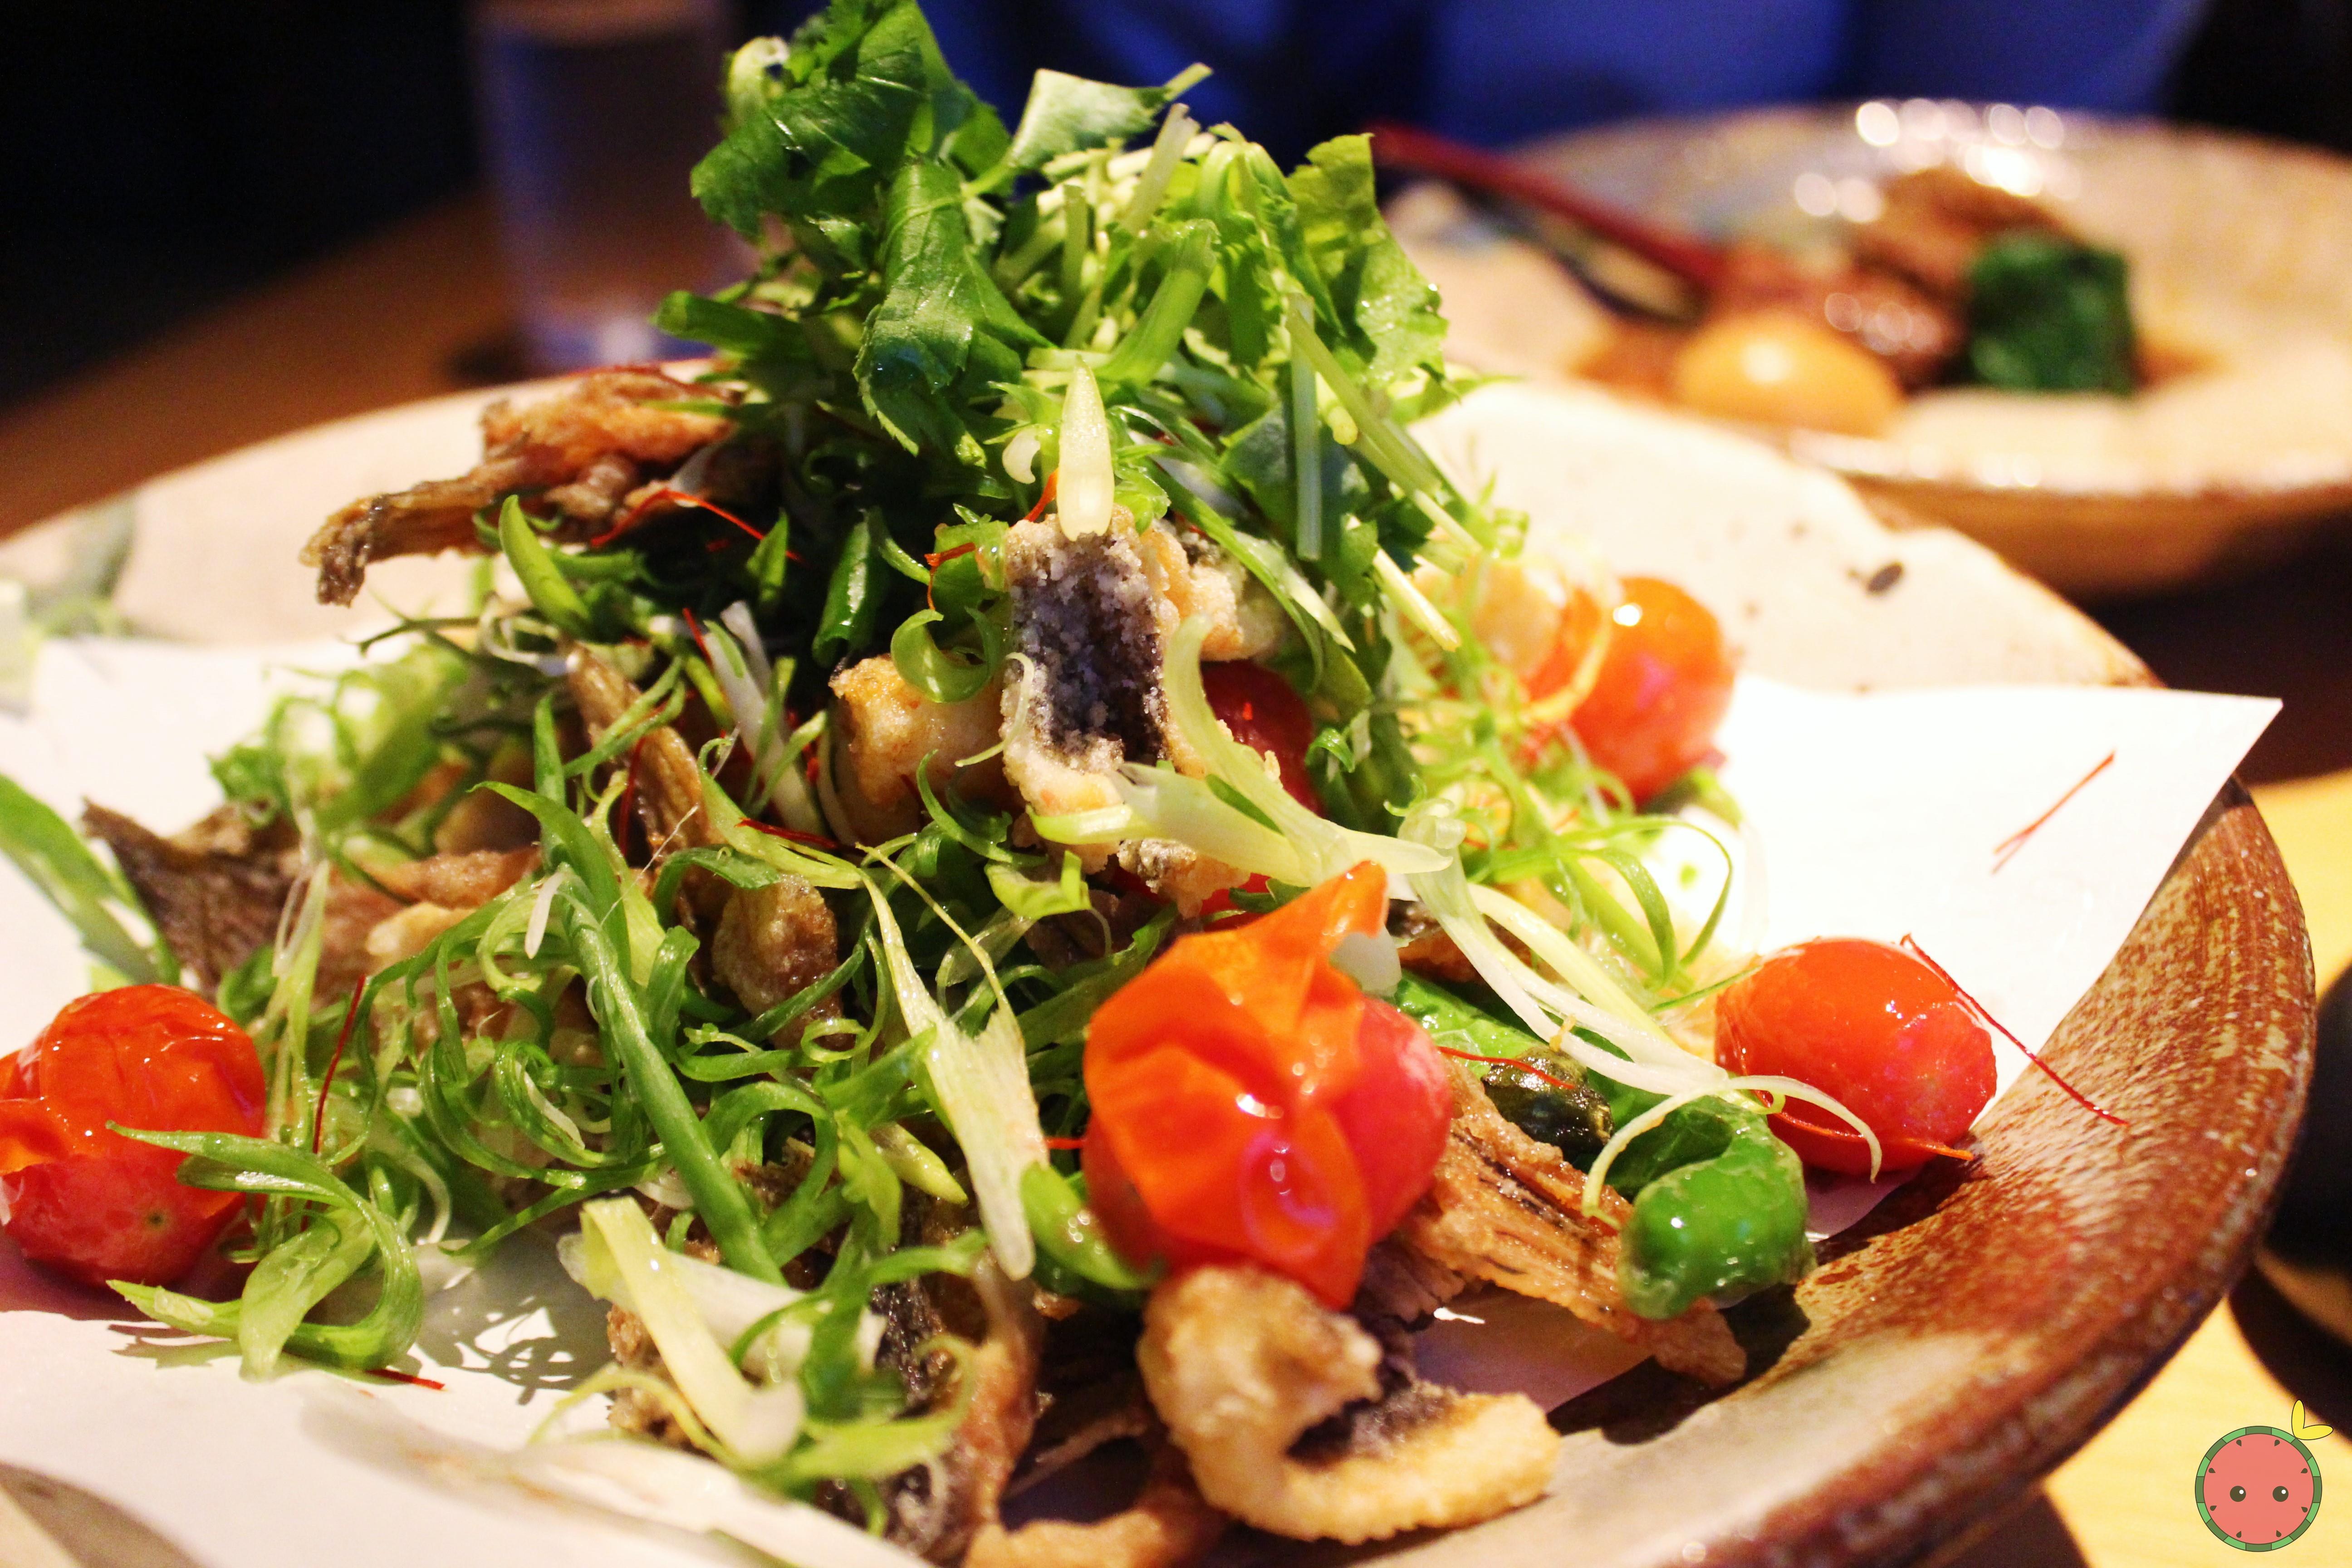 Karei Karaage - Seasoned flounder fried with shishito peppers, tomato, scallions, and its bones, wit